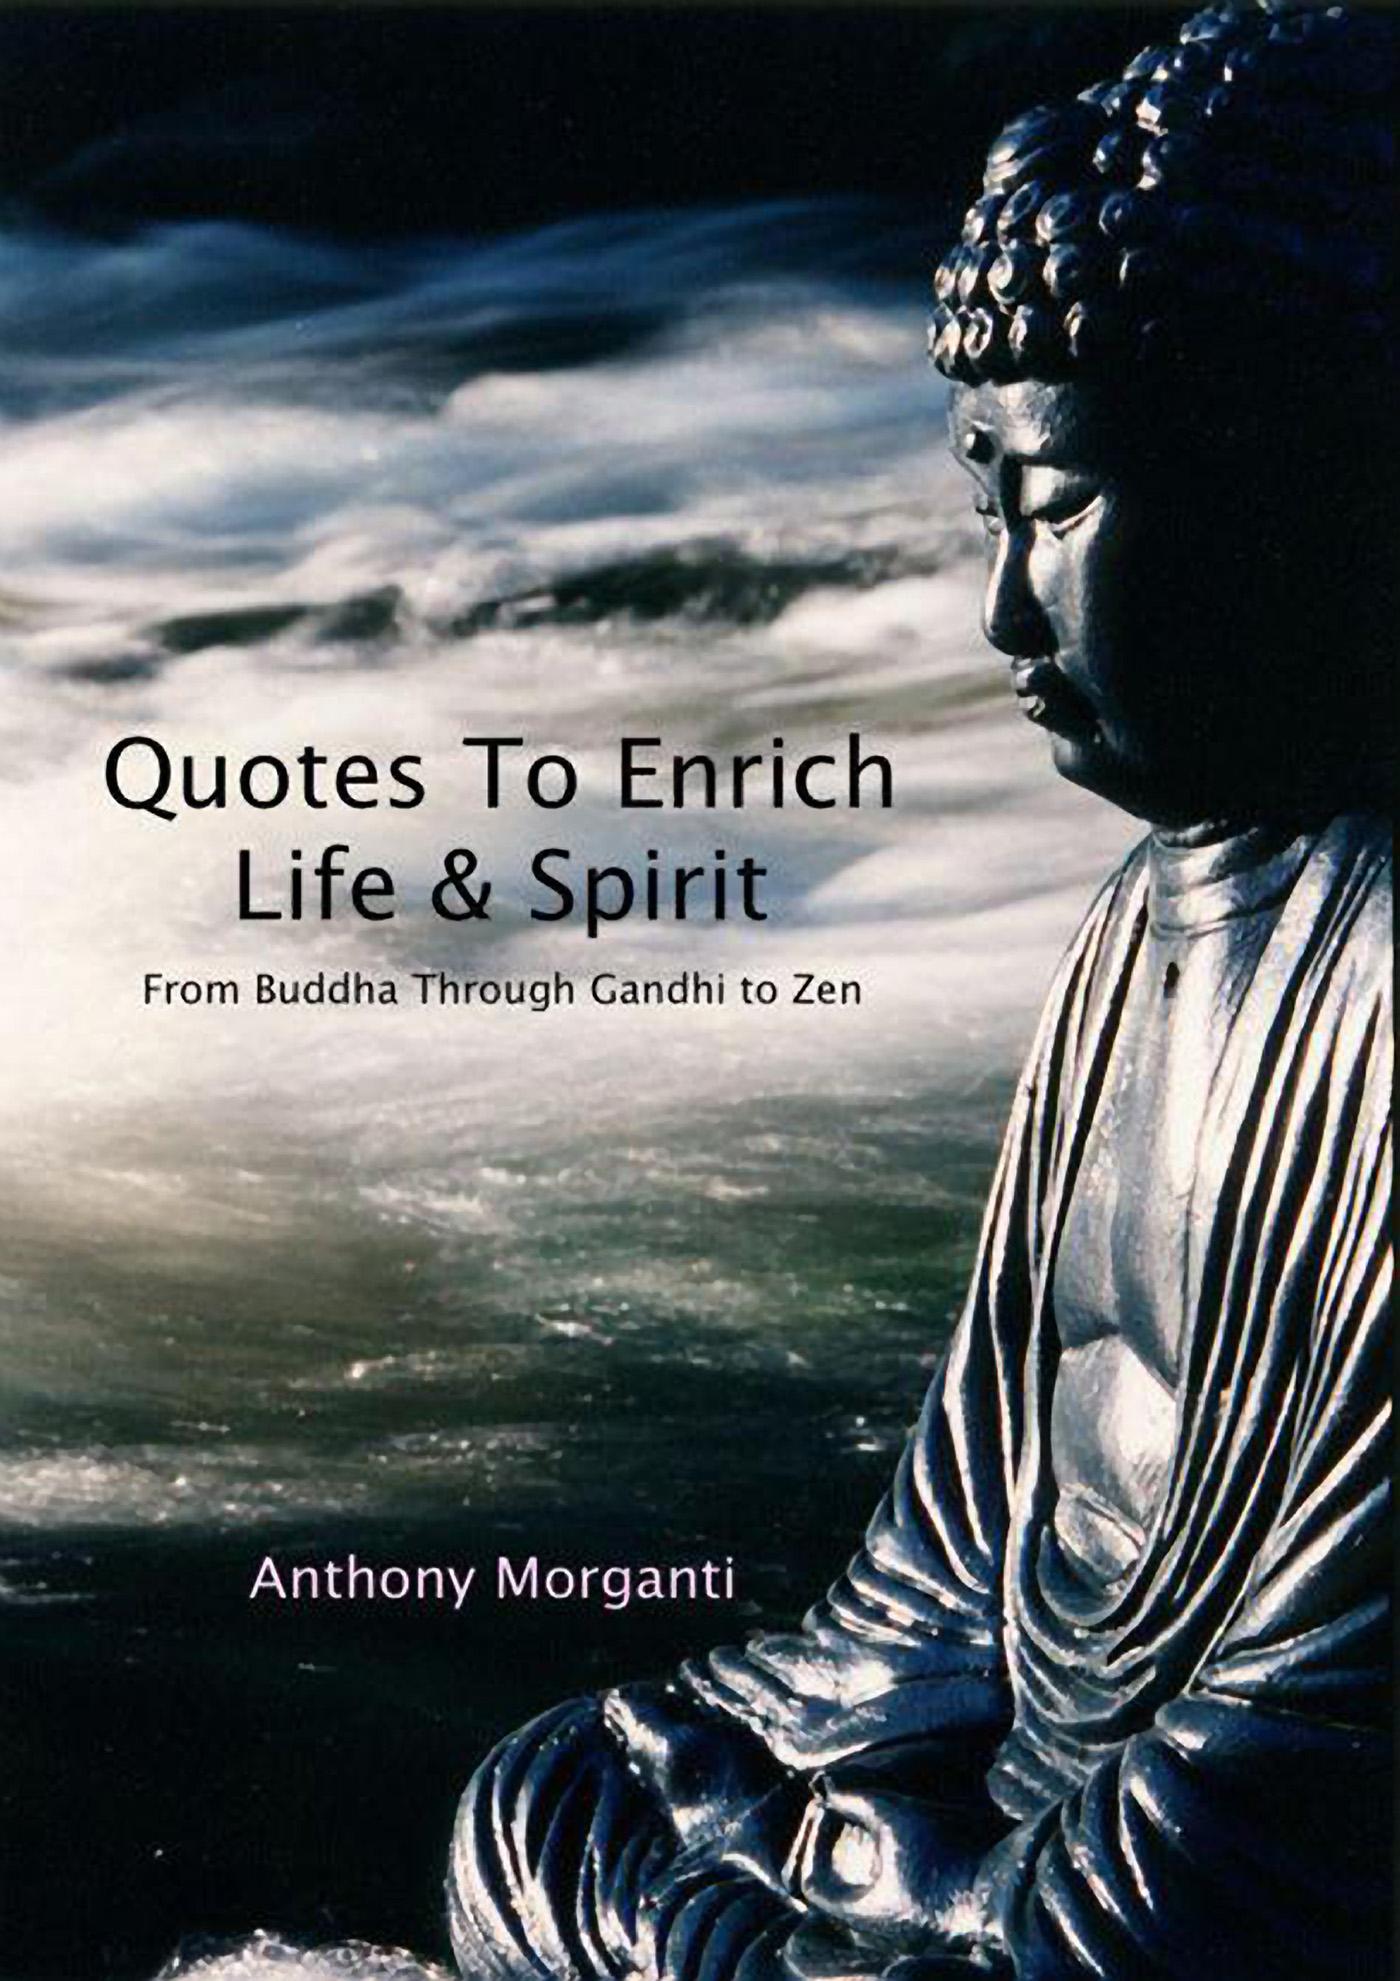 Quotes To Enrich Life Spirit From Buddha Through Gandhi To Zen An Ebook By Anthony Morganti